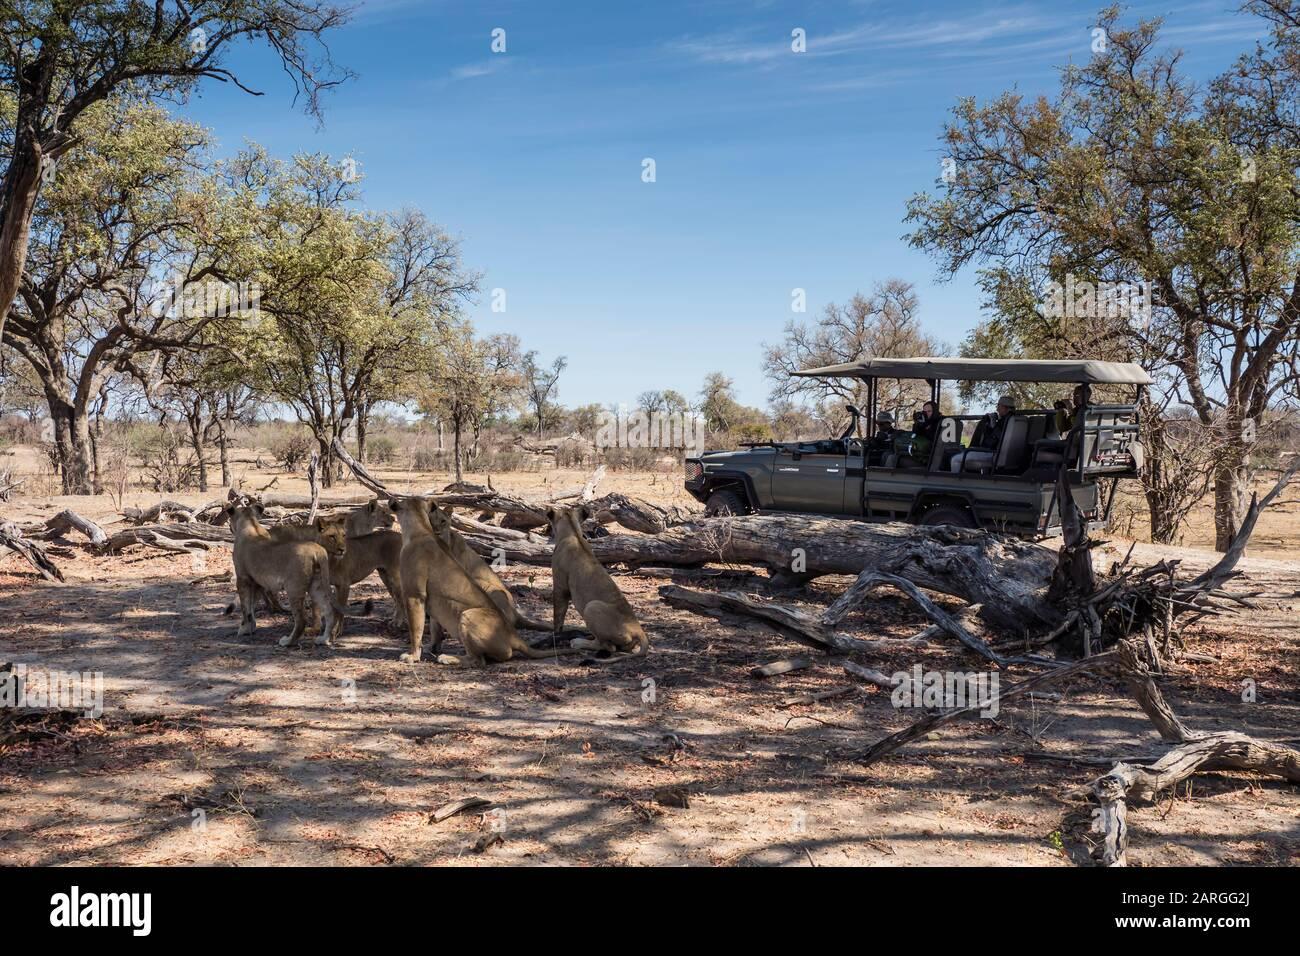 Orgullo de León (Panthera leo), descansando cerca de un vehículo safari en el Parque Nacional de Chobe, Botswana, África Foto de stock